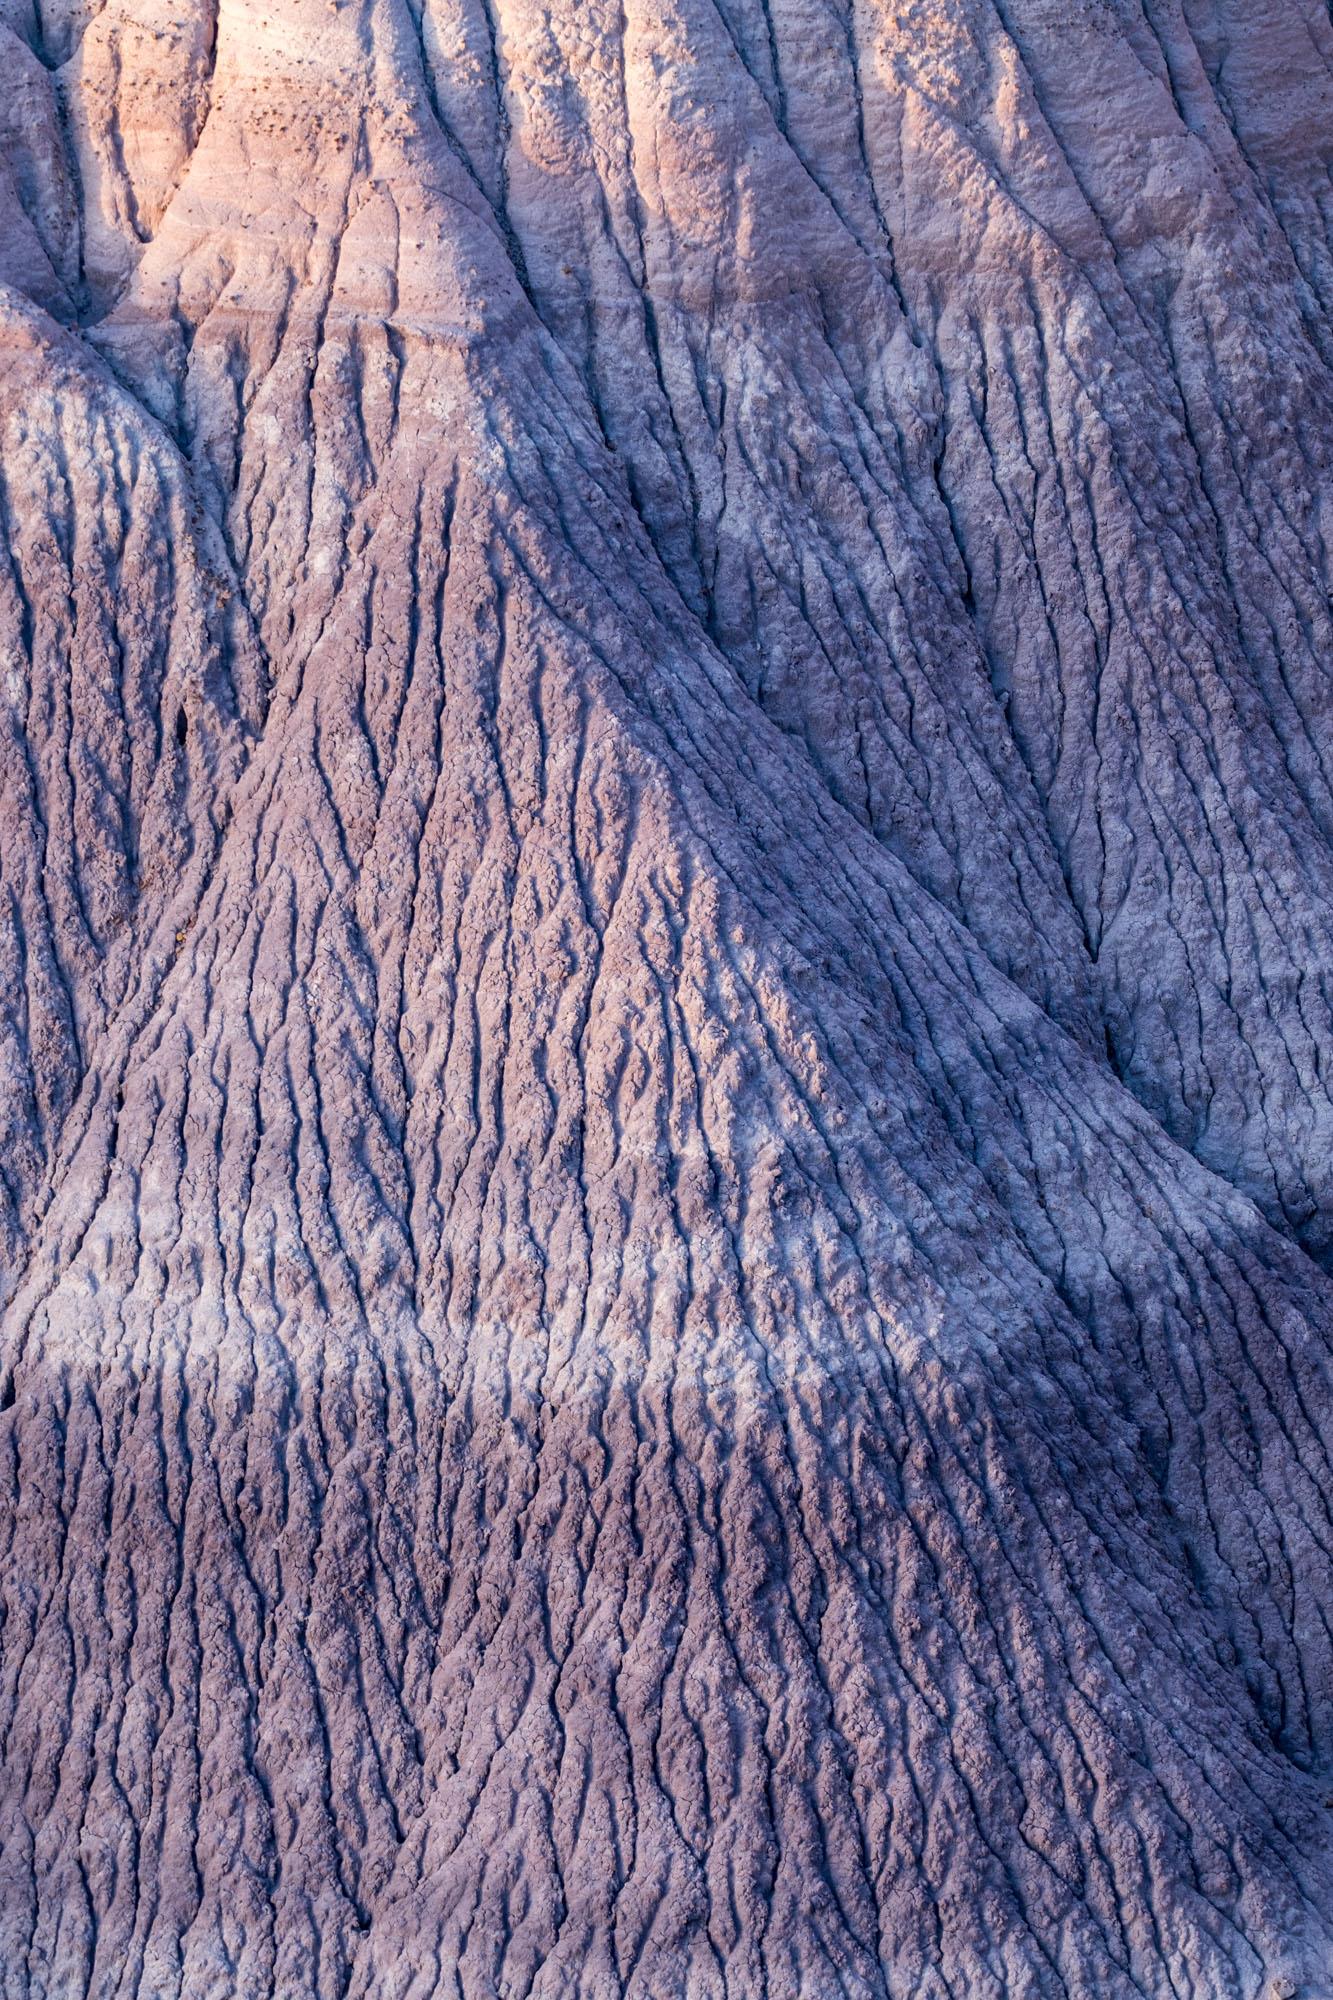 Petrified Forest National Park - 014.jpg